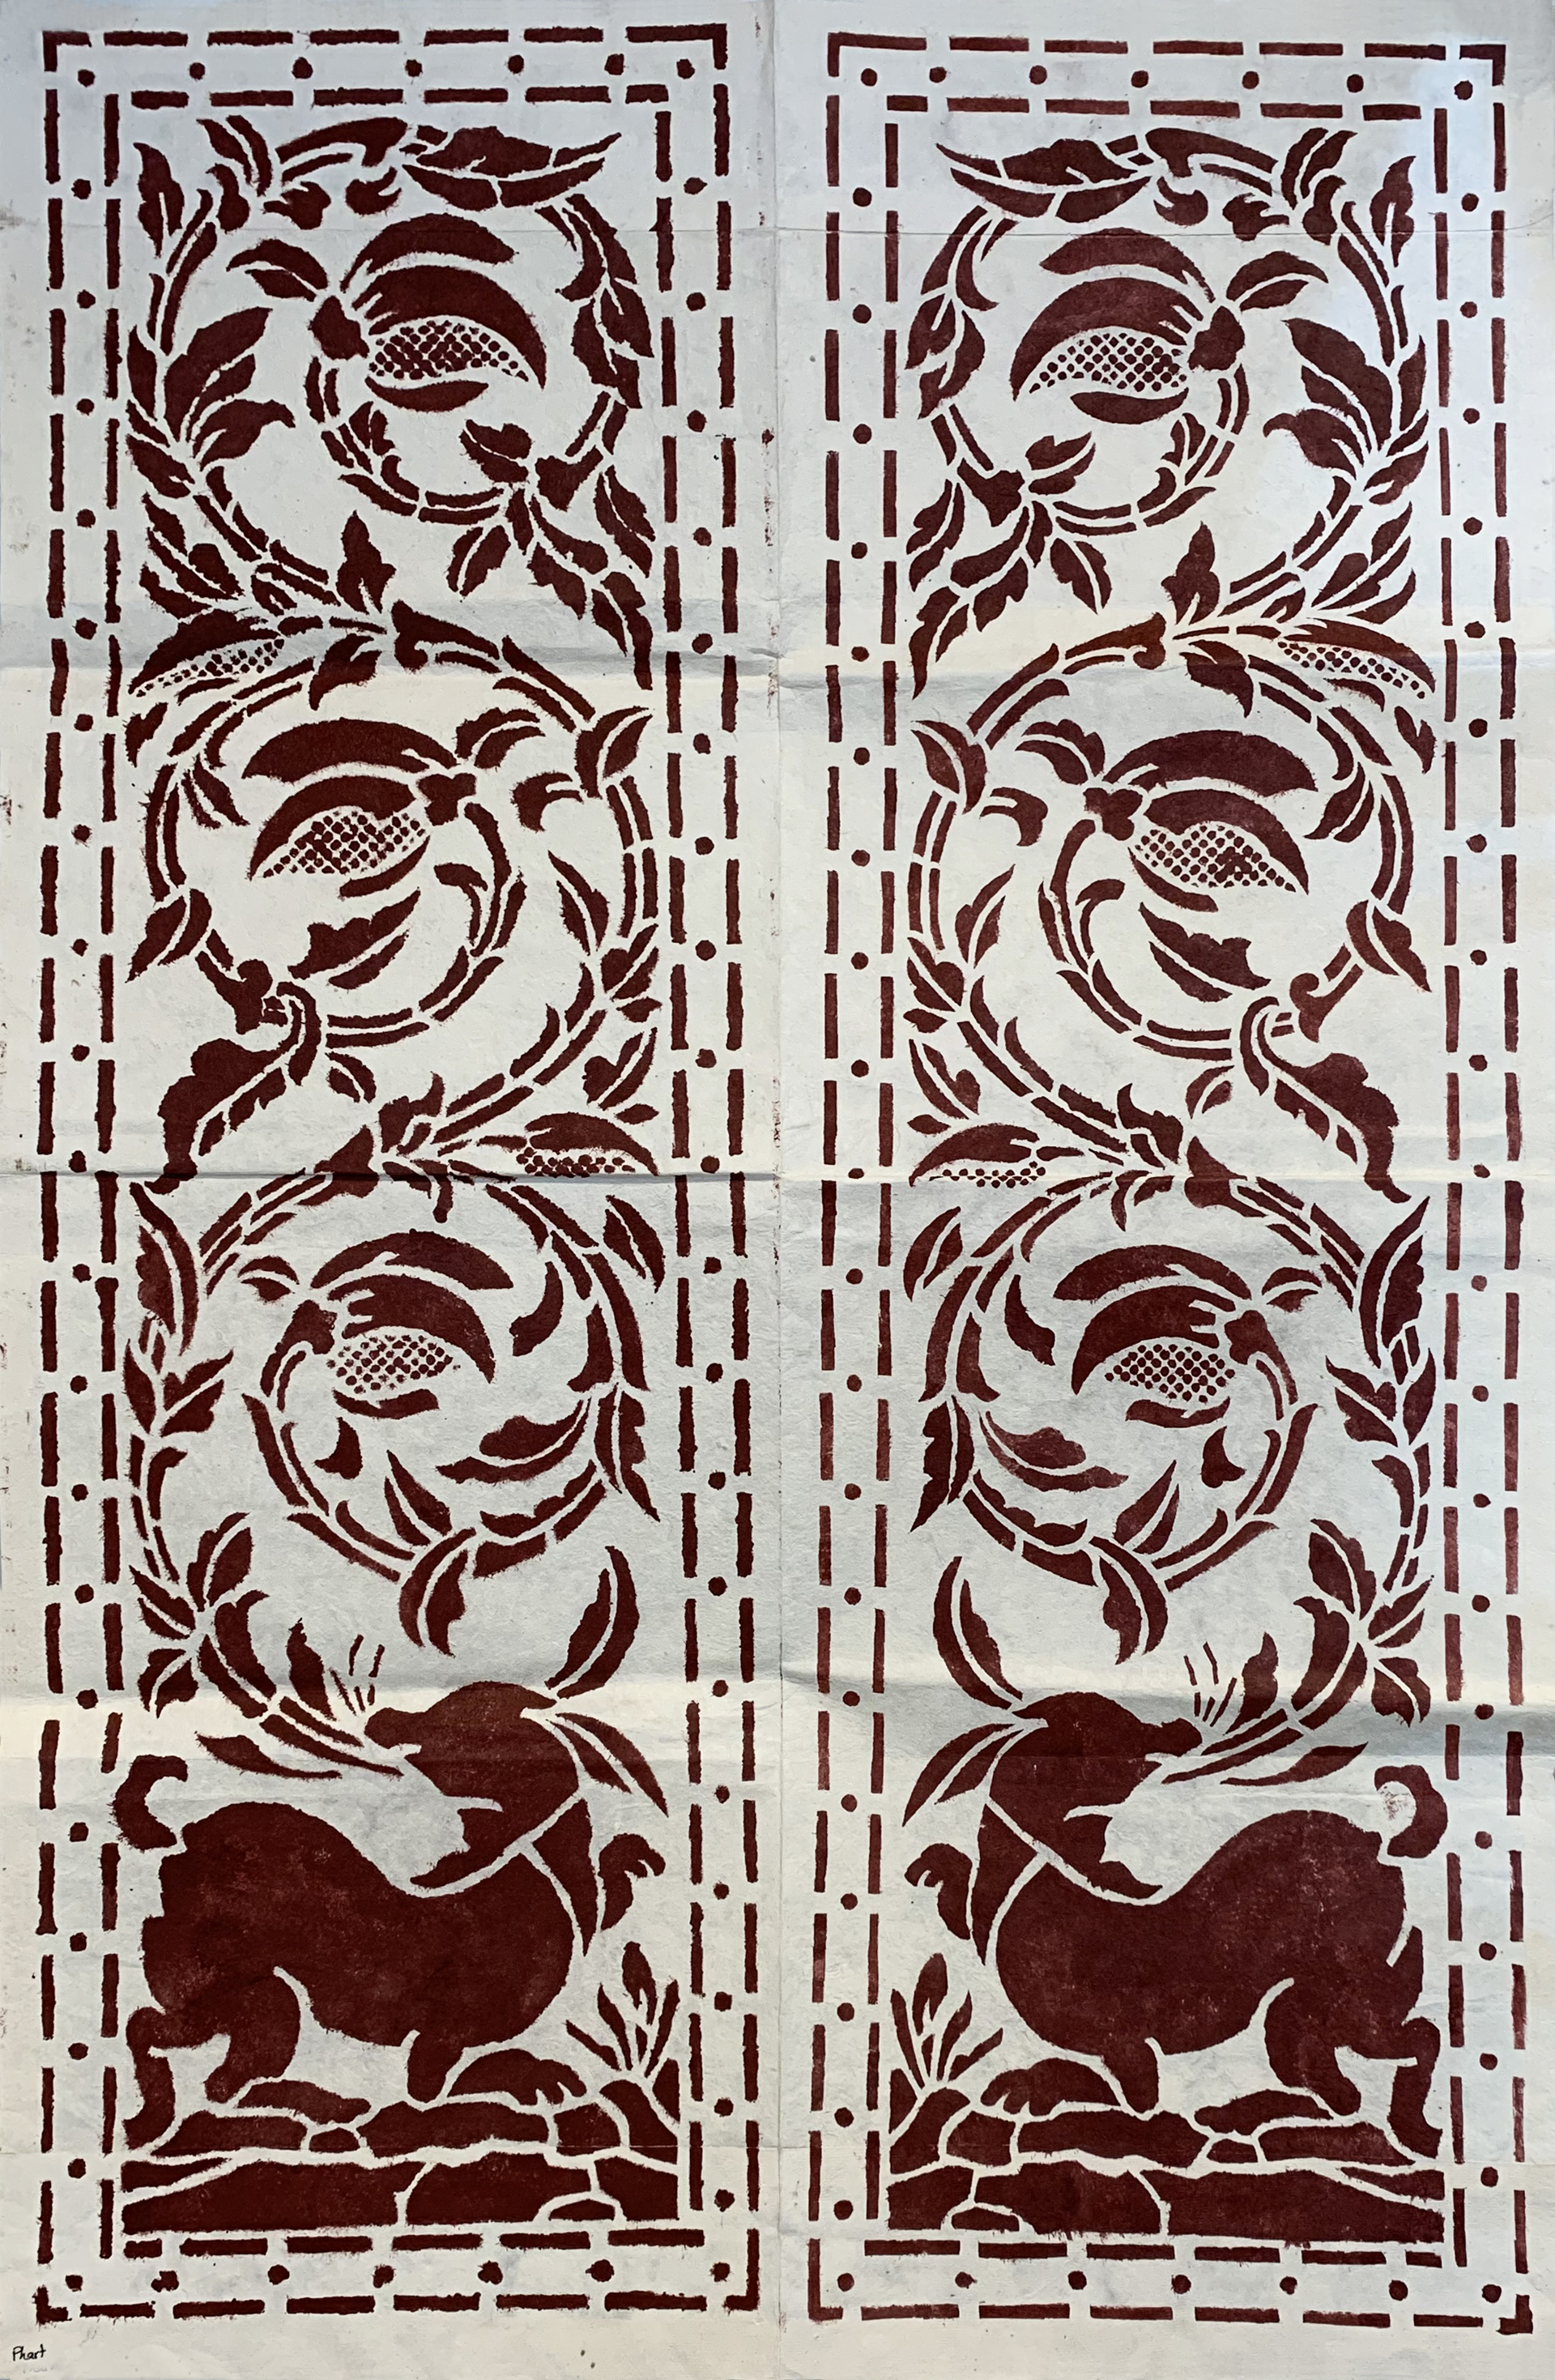 Joyful Rabbit: Cutting Stencil Positive by Tiao Nithakhong Somsanith